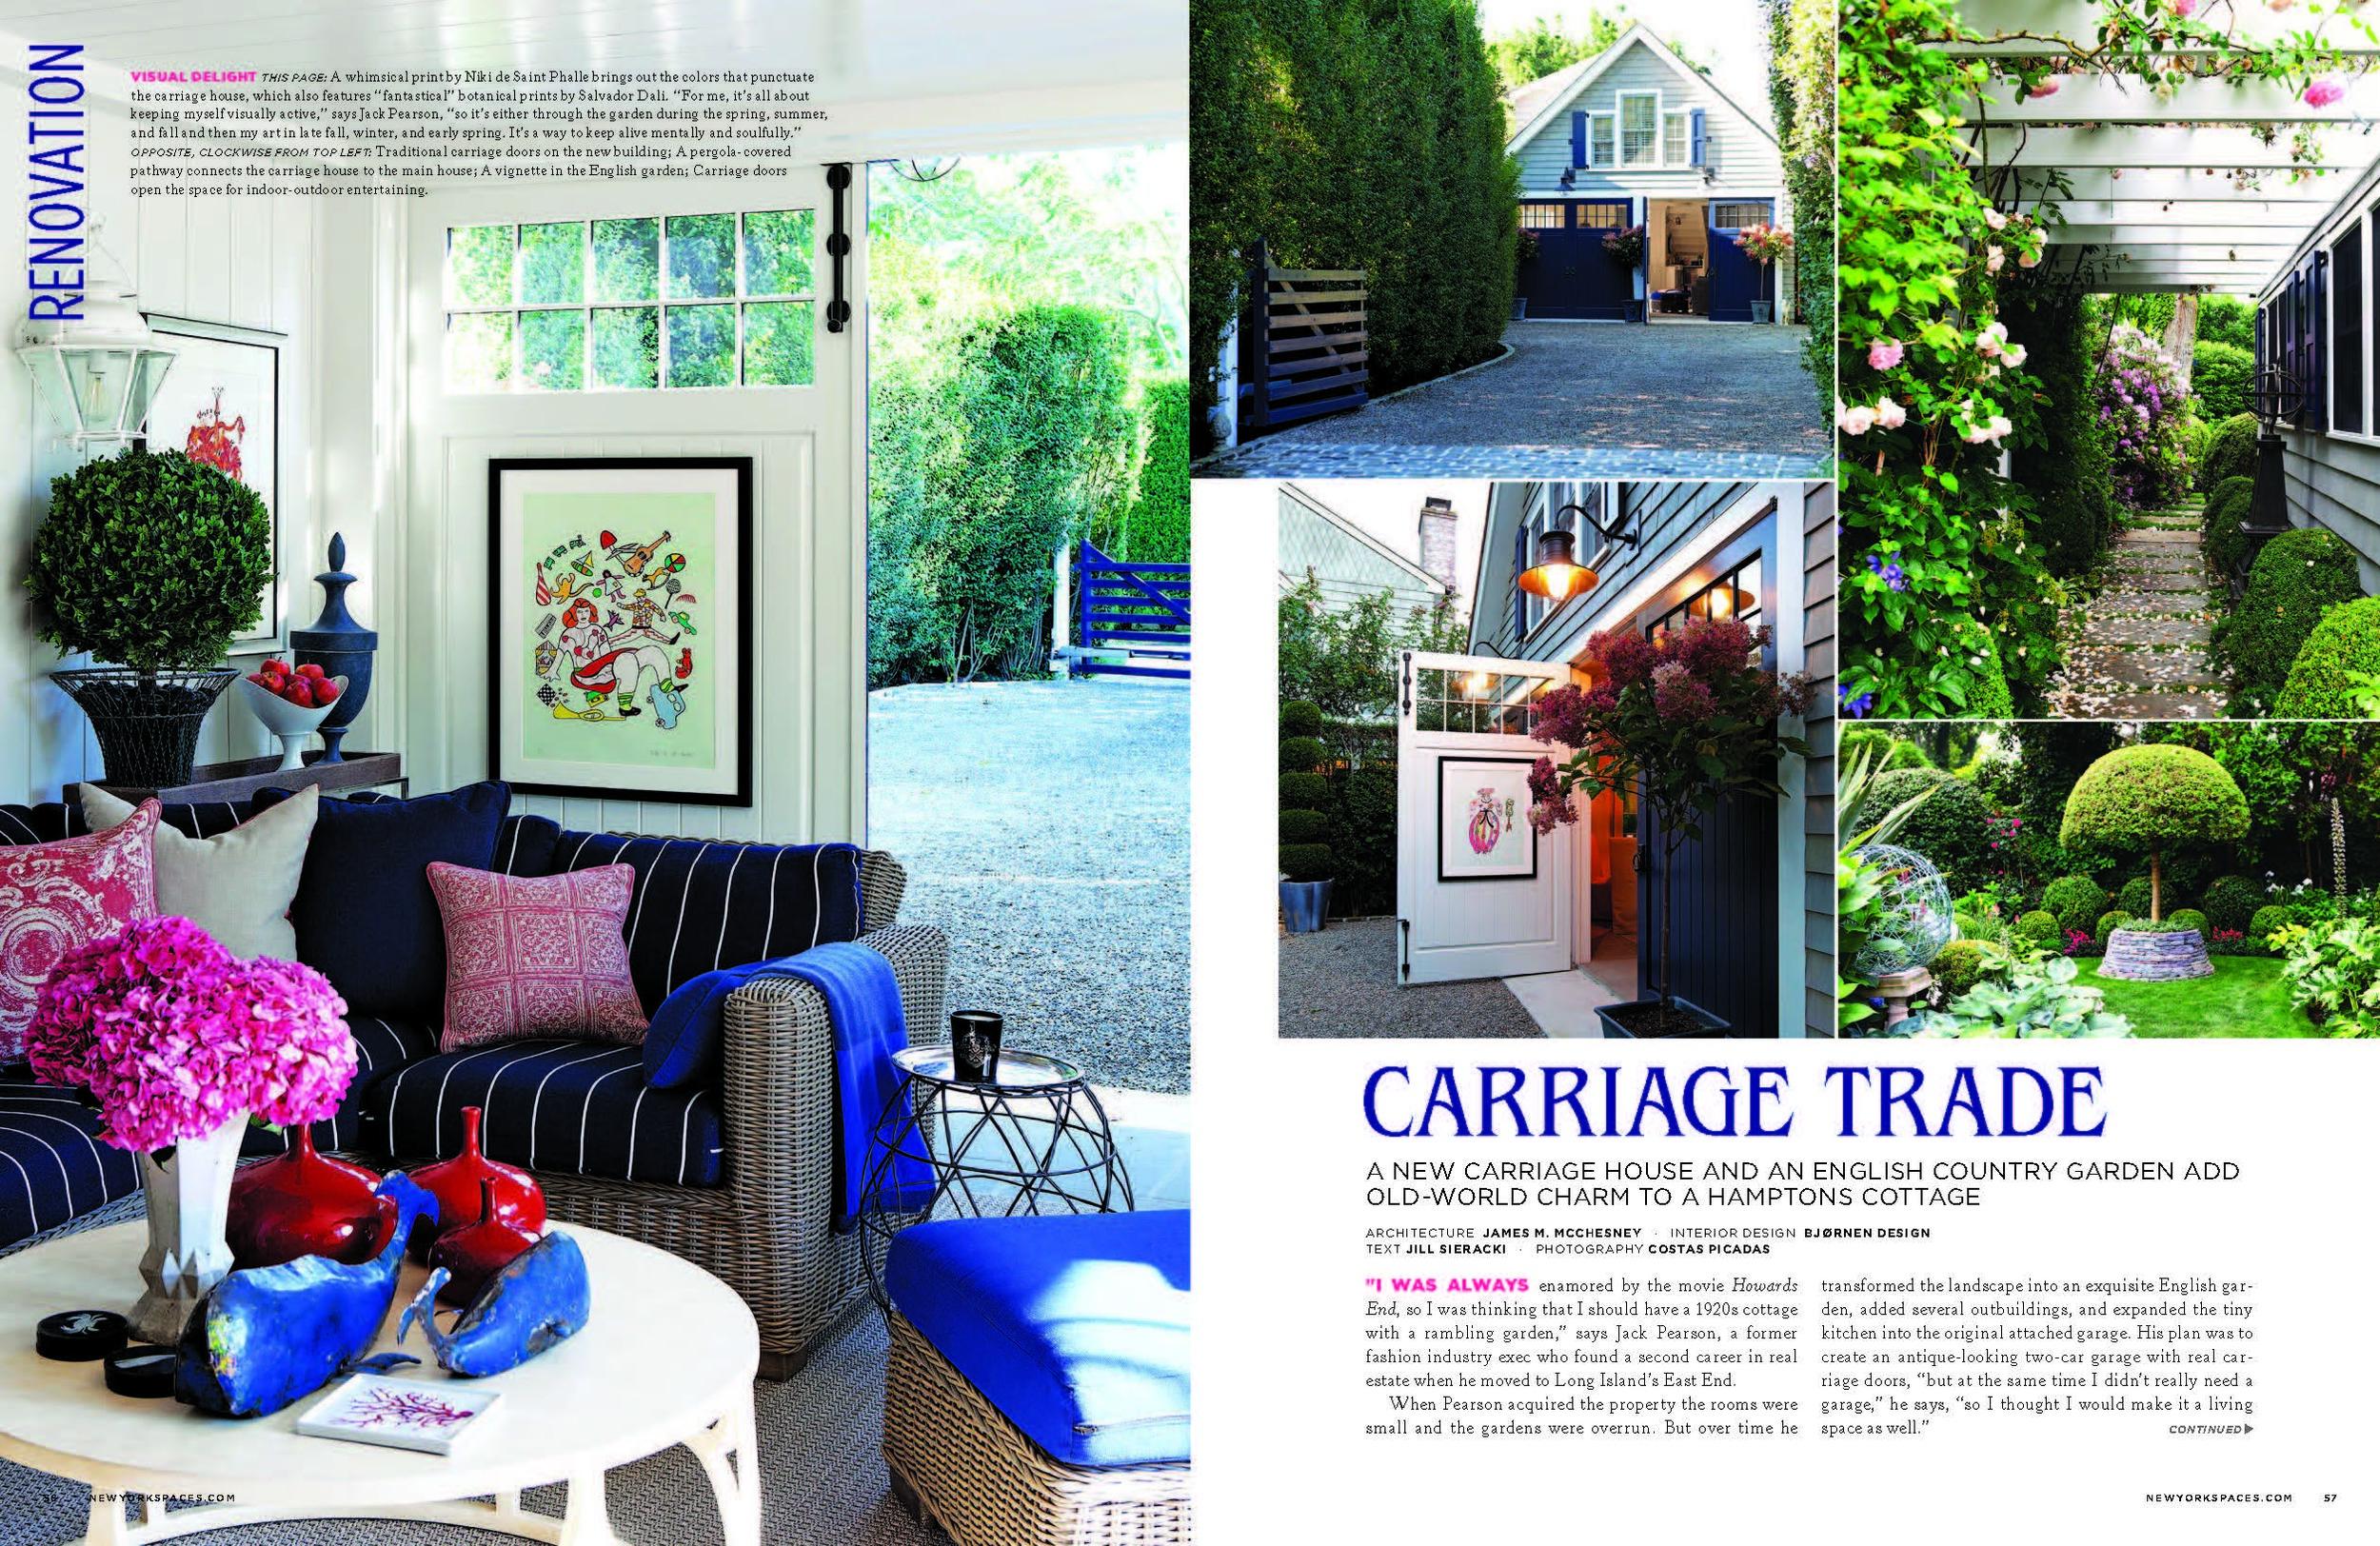 HamptonsCarriageHouse_Page_1.jpg